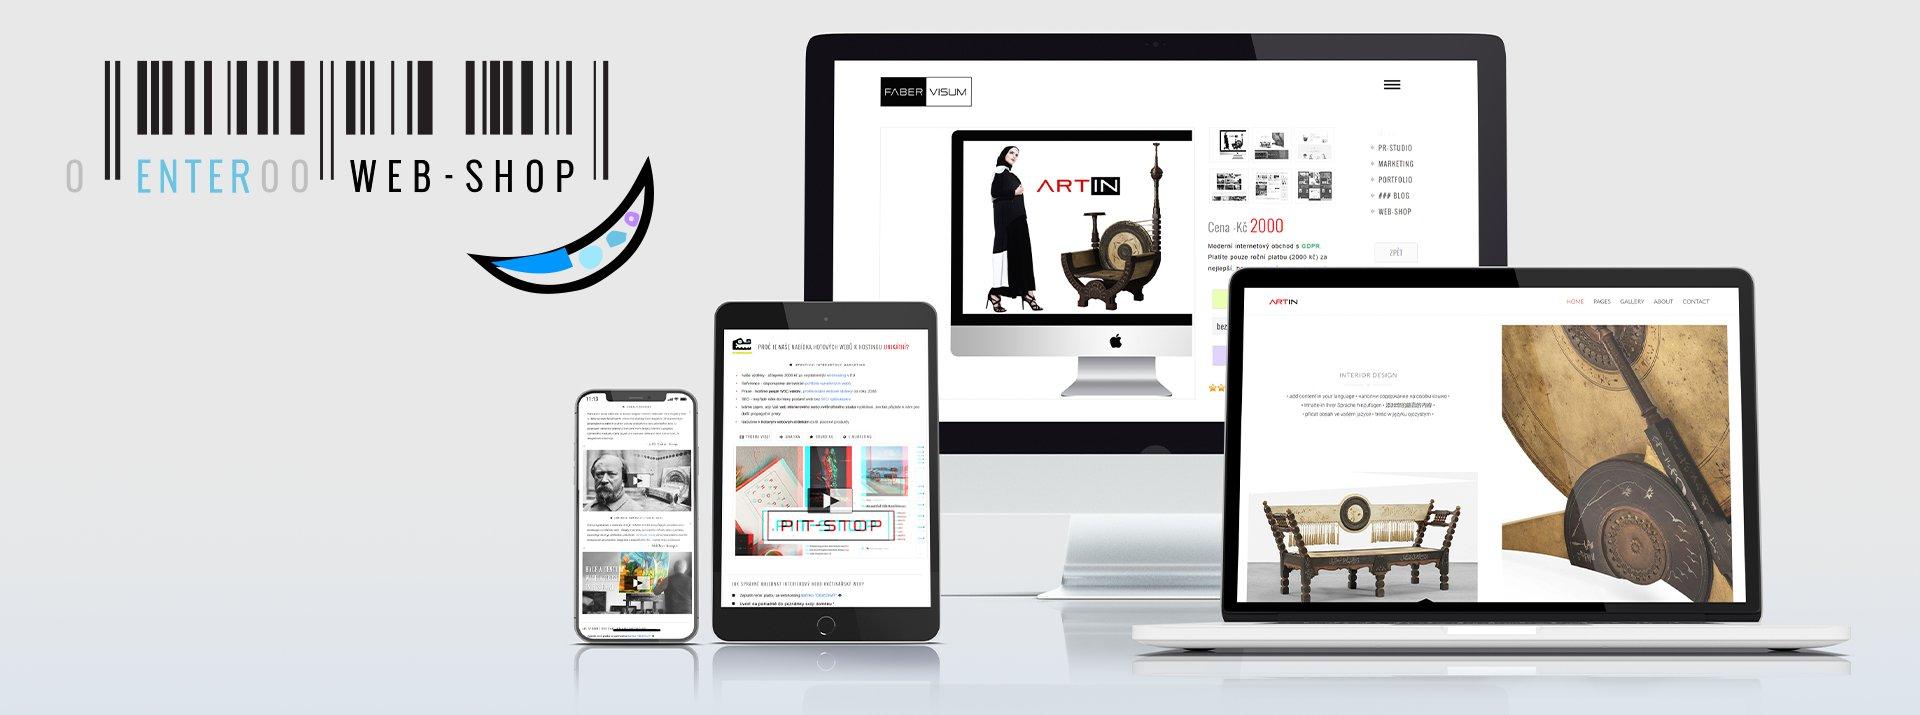 interior-website-for-sale-03.jpg